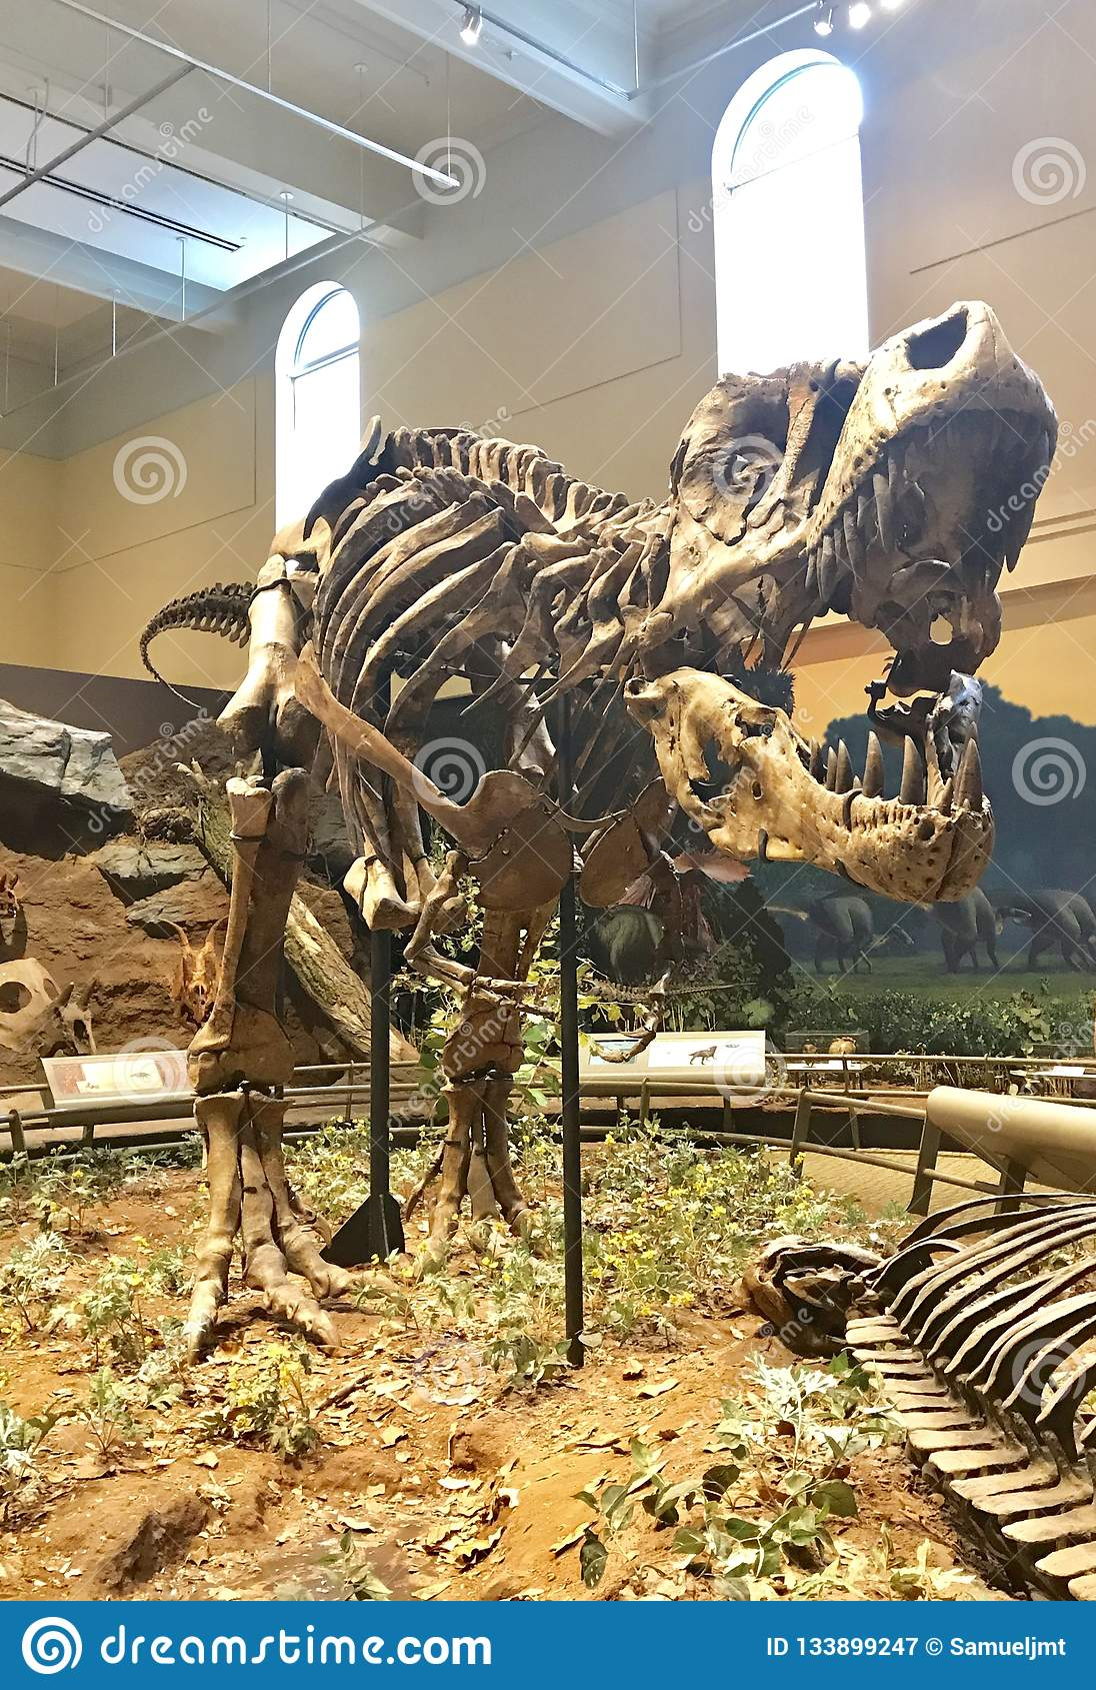 Fósil del primer tiranosaurio Rex descubierto en el mundo